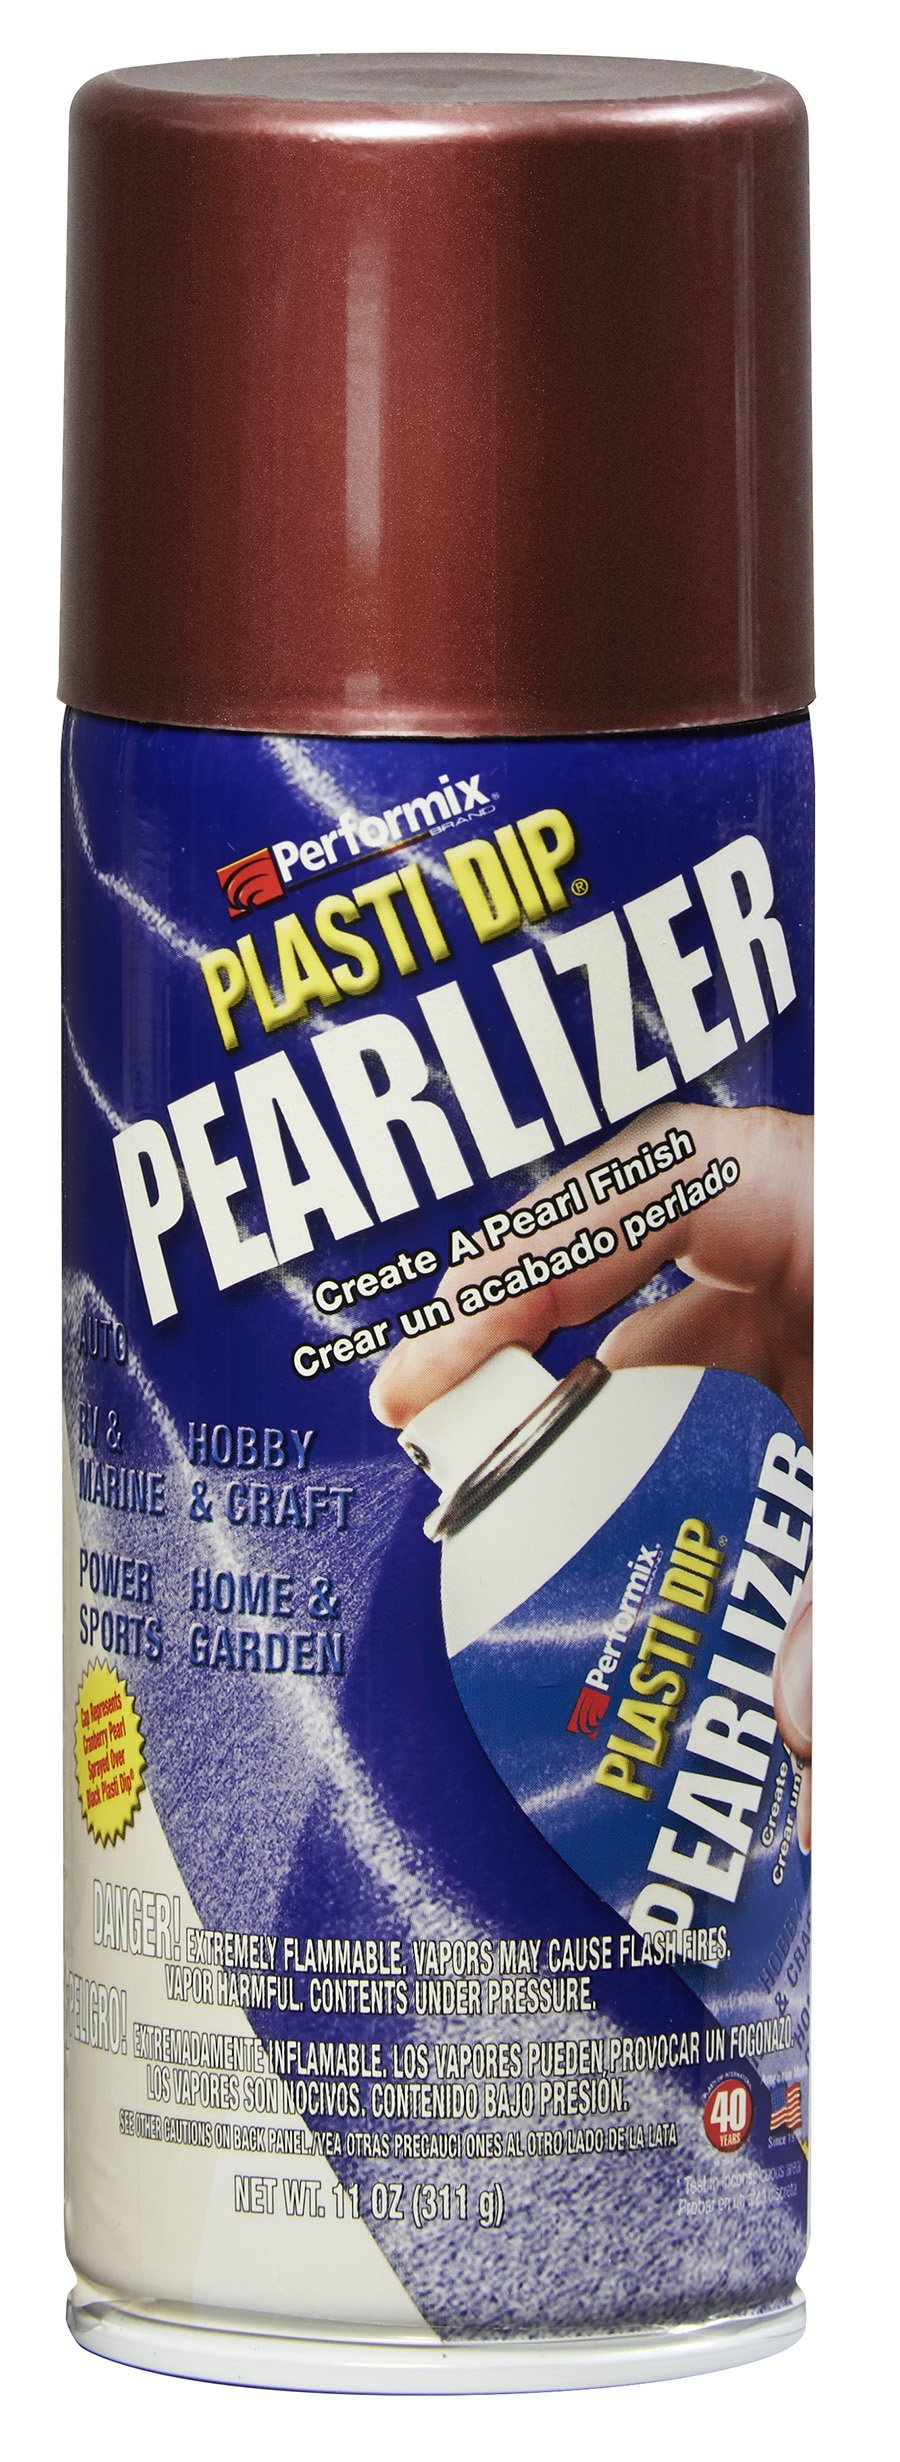 Performix 11290-6-6PK Cranberry Pearlizer Spray - 11 oz., (Pack of 6)